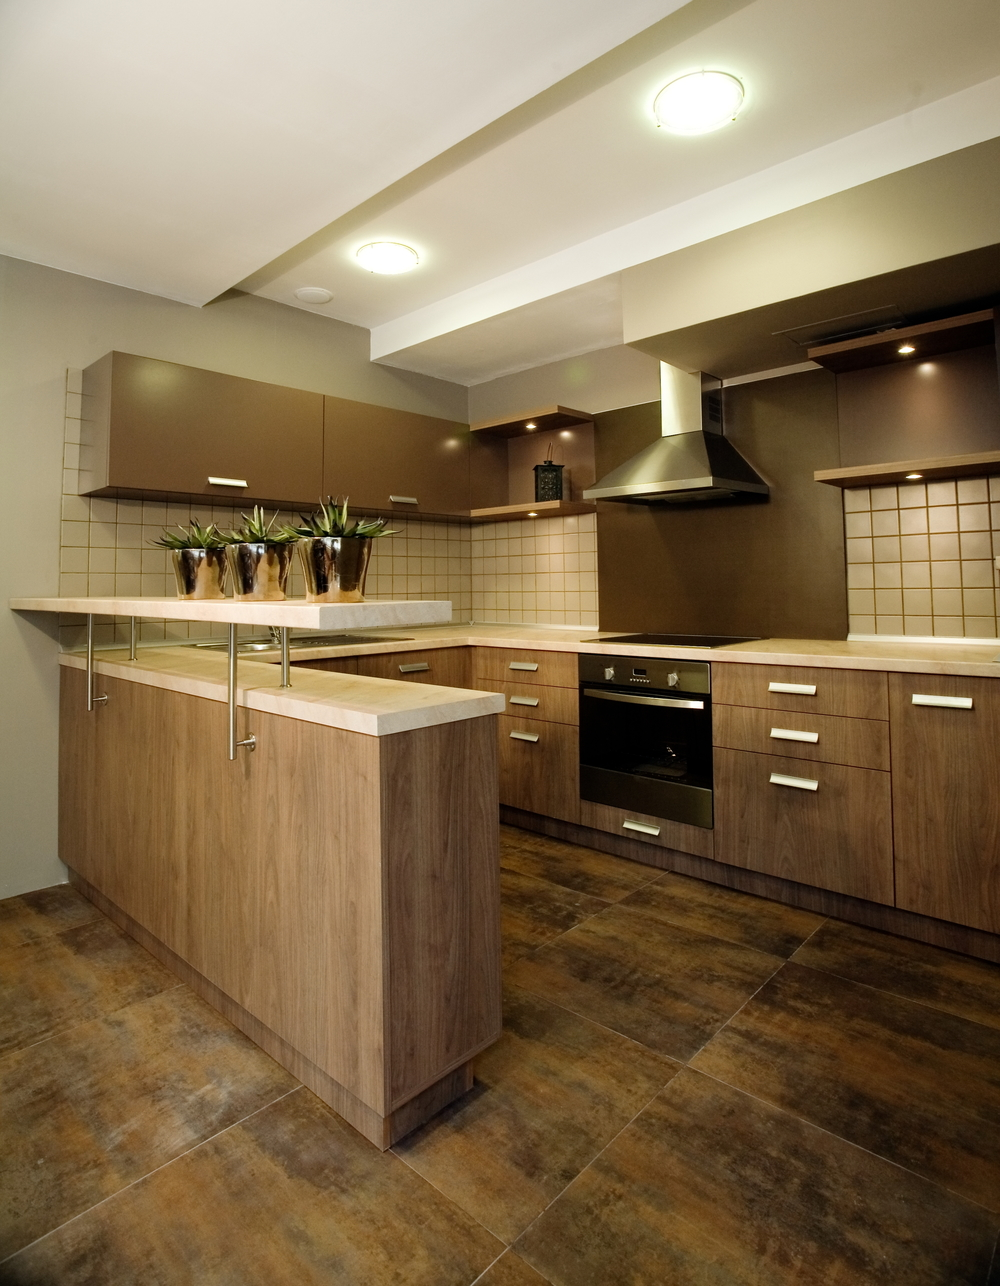 1oak_kitchen40.jpg